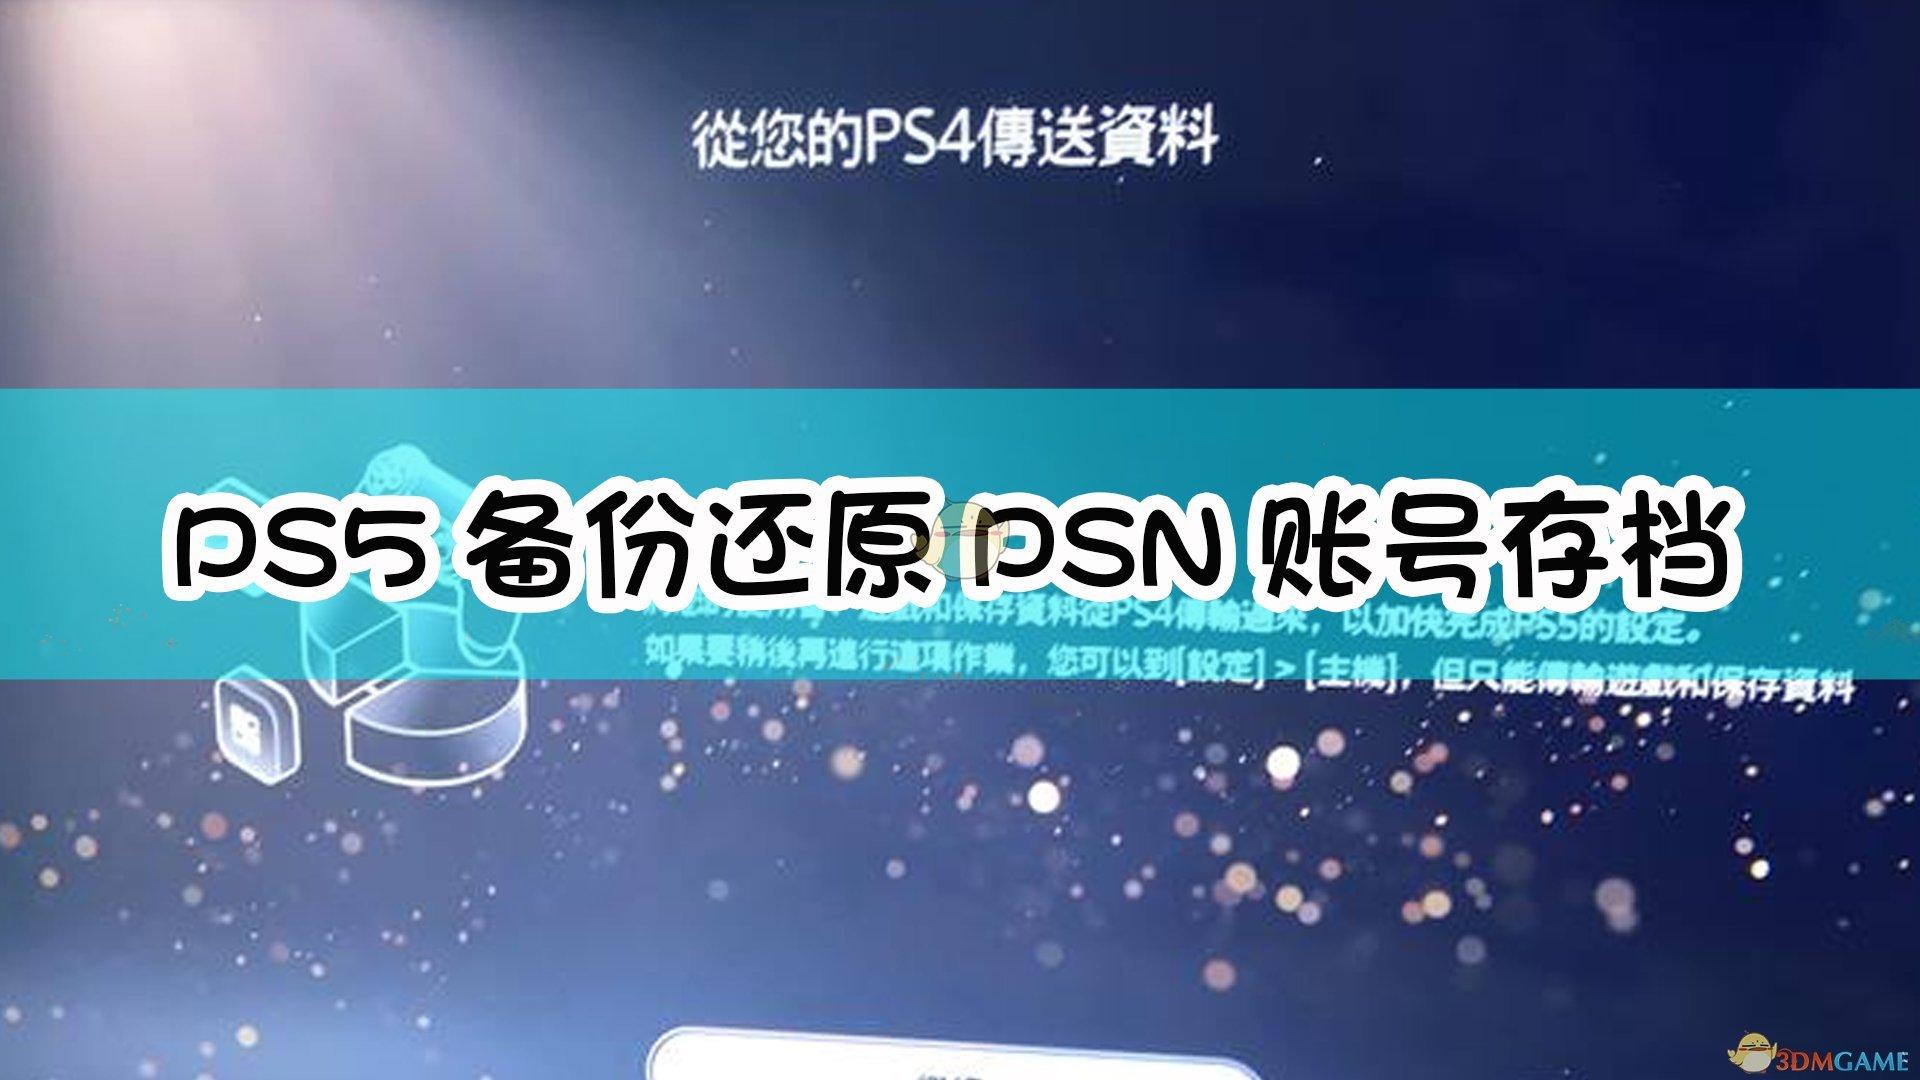 PS5备份还原PSN账号存档数据详细方法介绍